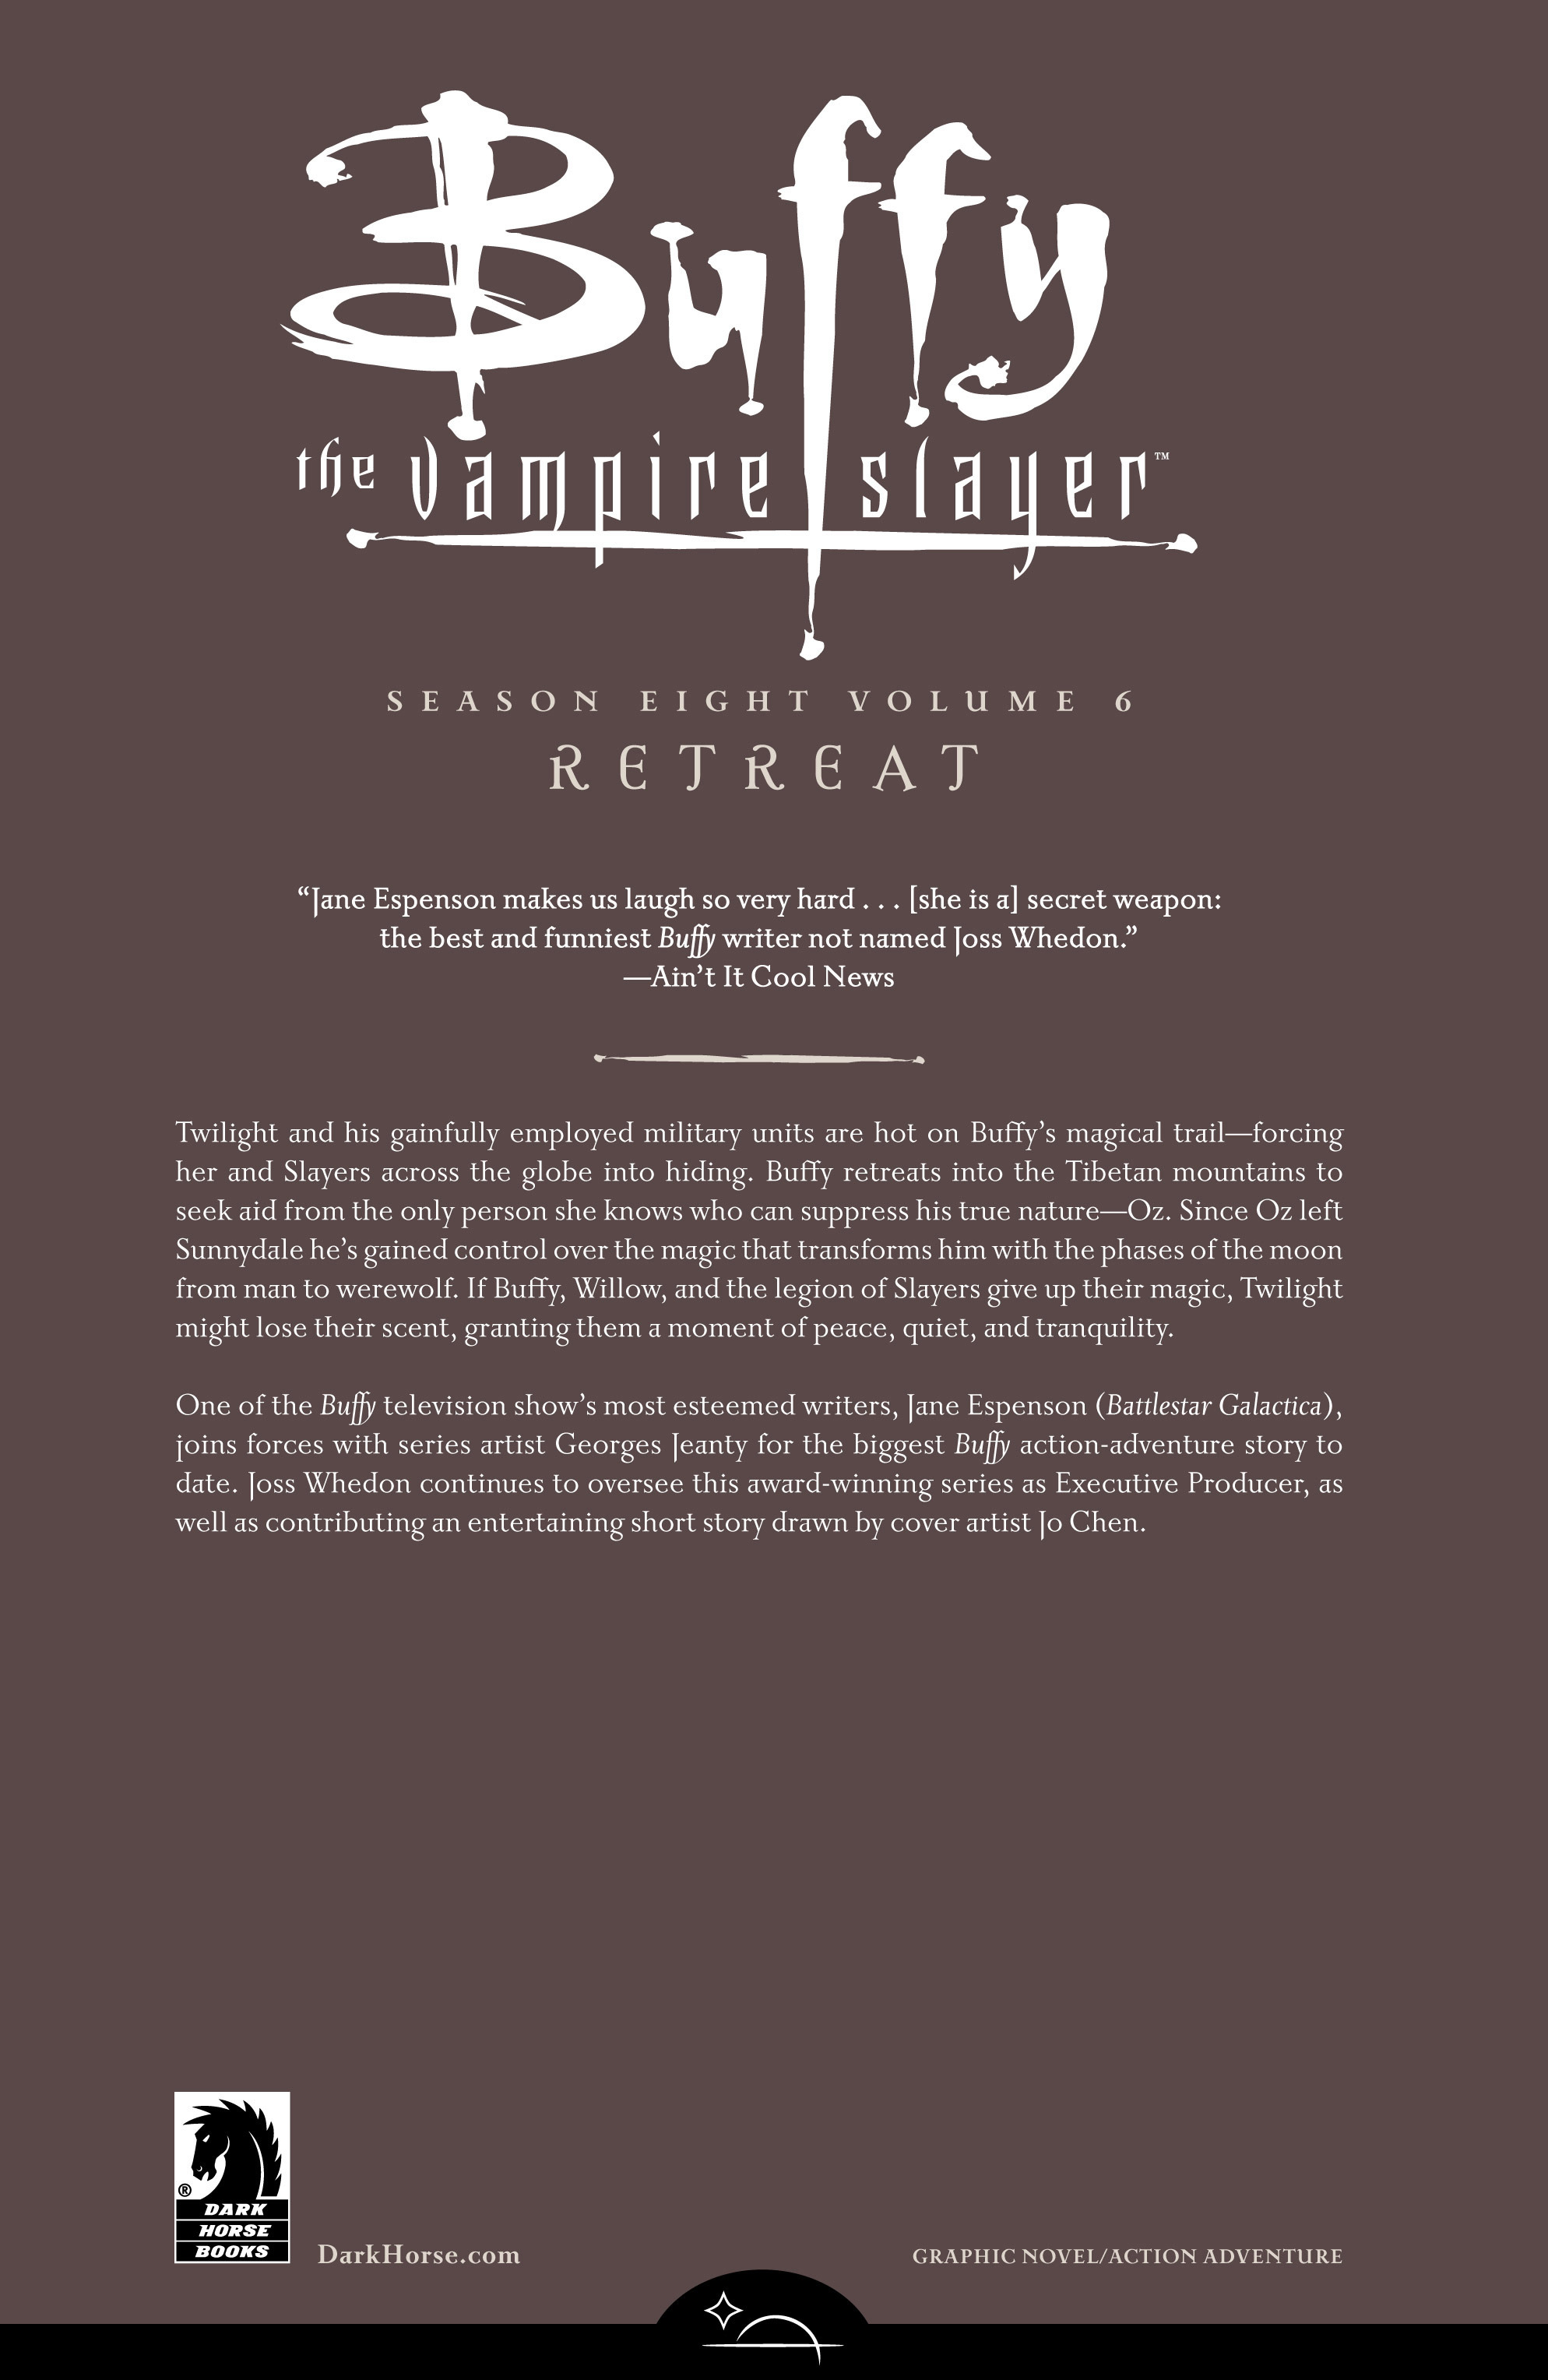 Buffy the Vampire Slayer Season Eight _TPB_6_-_Retreat Page 138